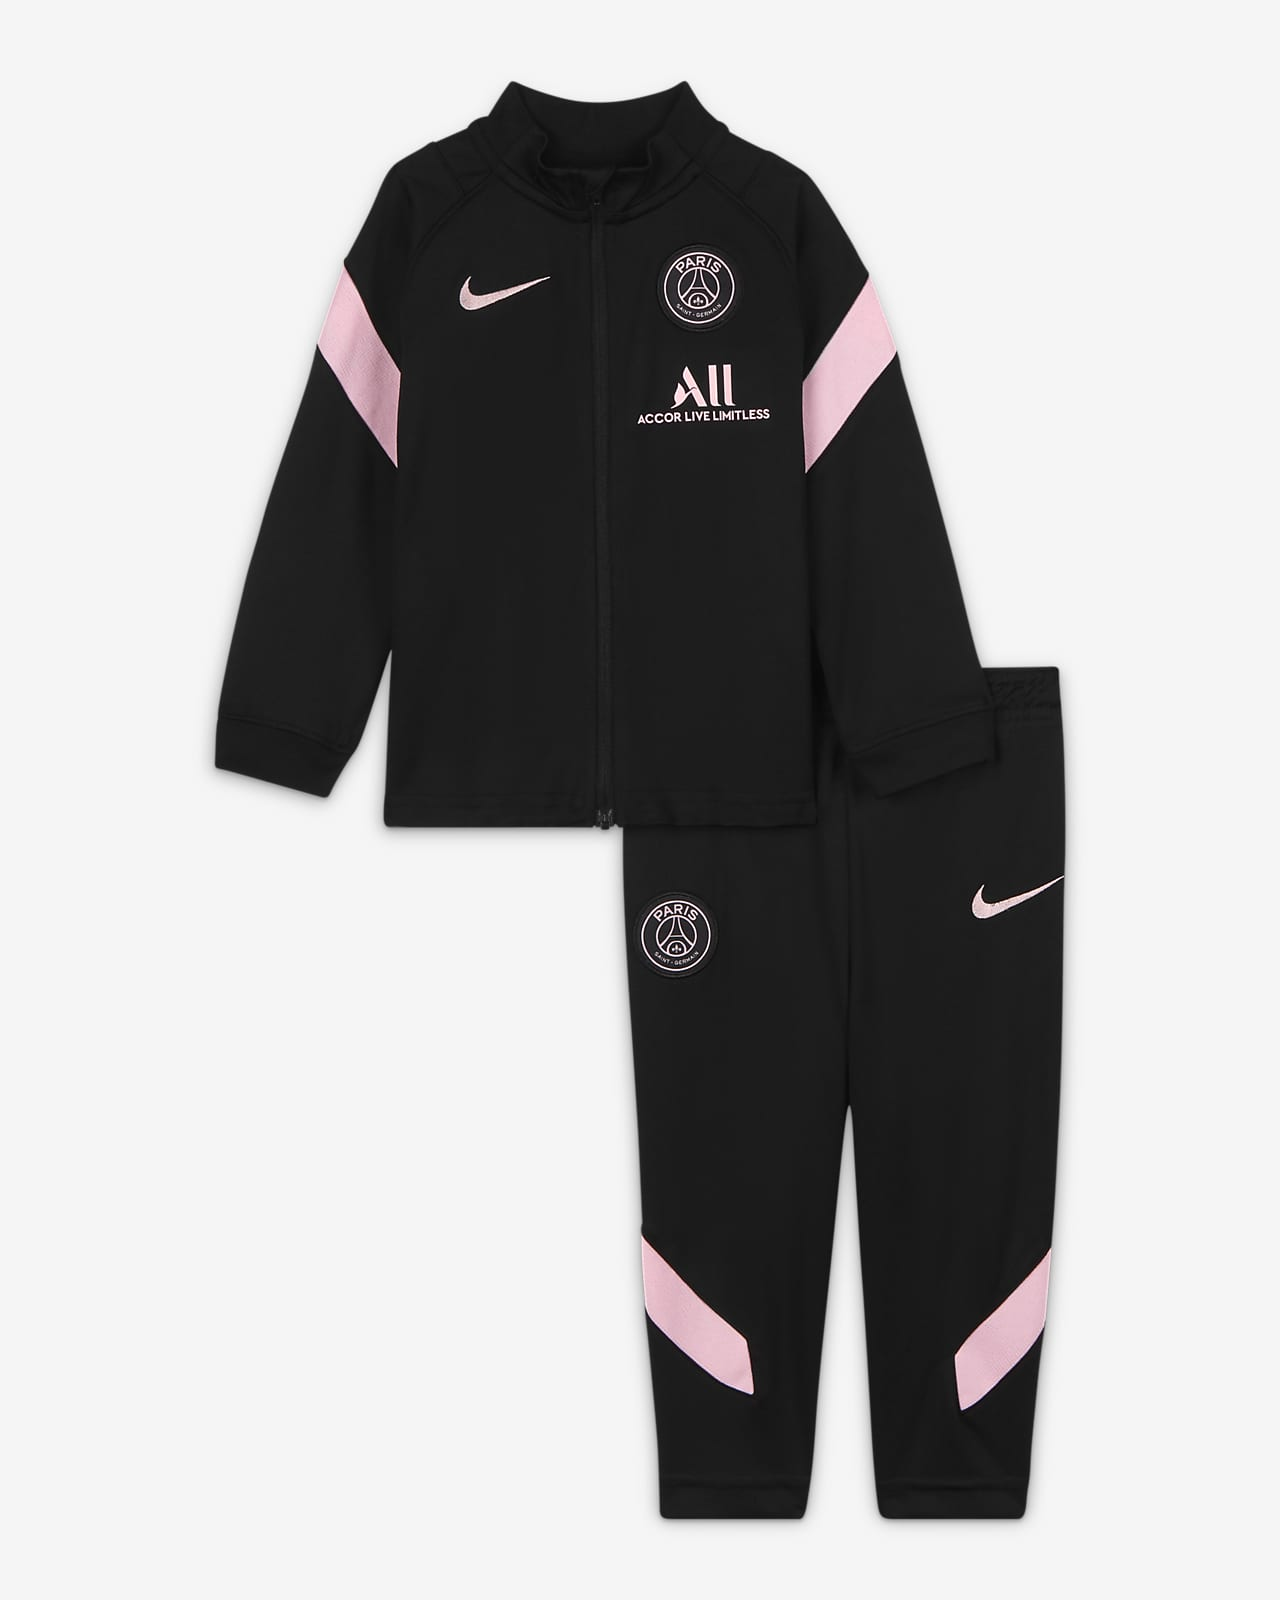 Tuta da calcio in maglia Nike Dri-FIT Paris Saint-Germain Strike per neonati/bimbi piccoli - Away